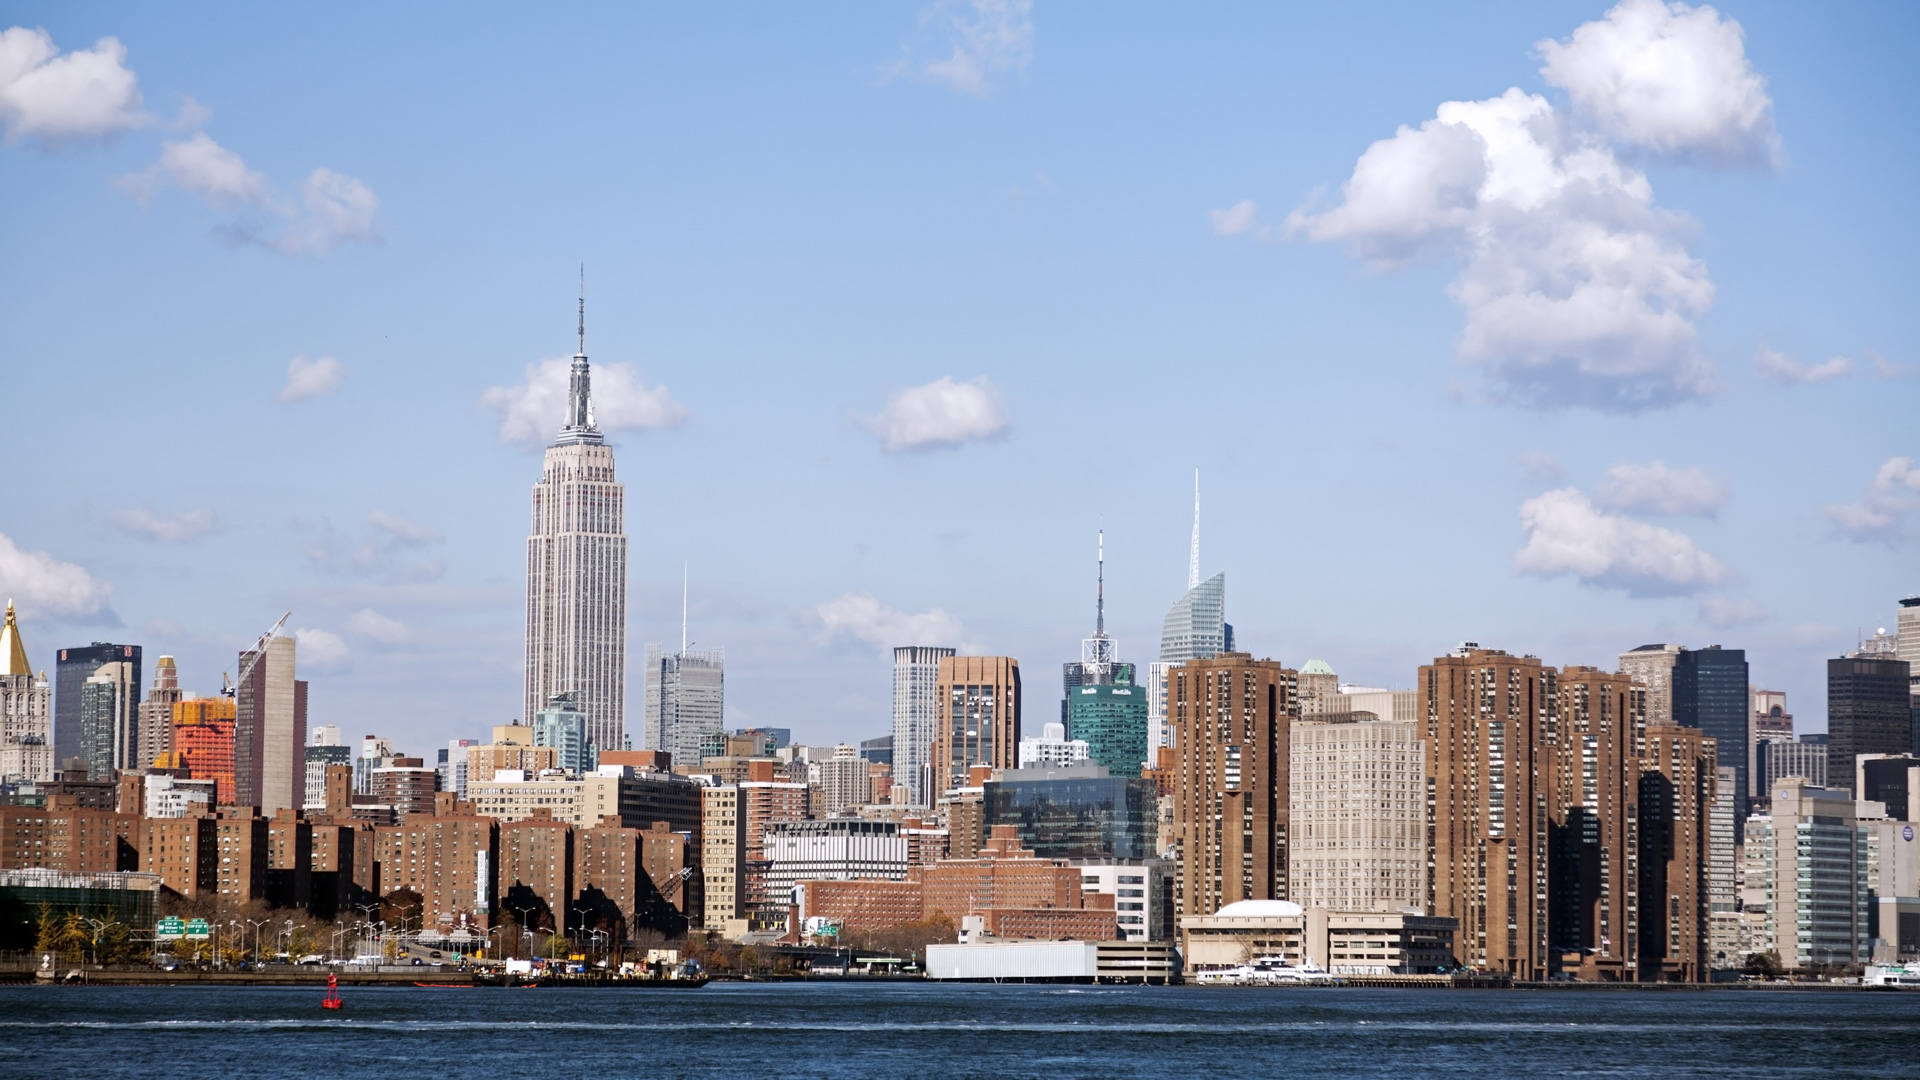 New York, New York skyline